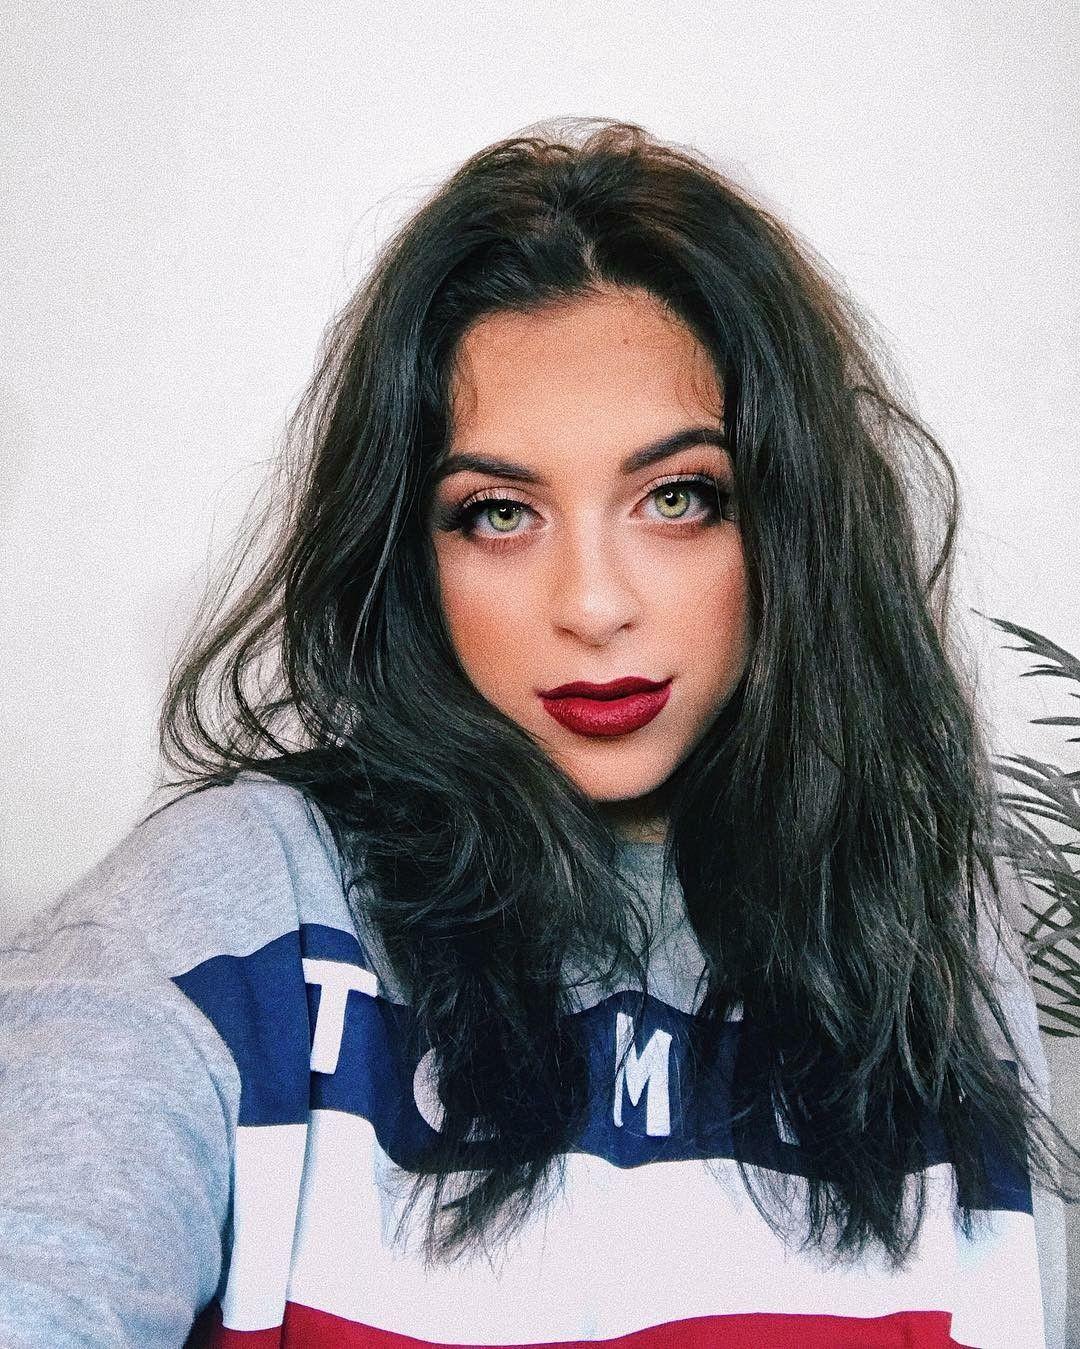 Baby ariel makeup tumblr